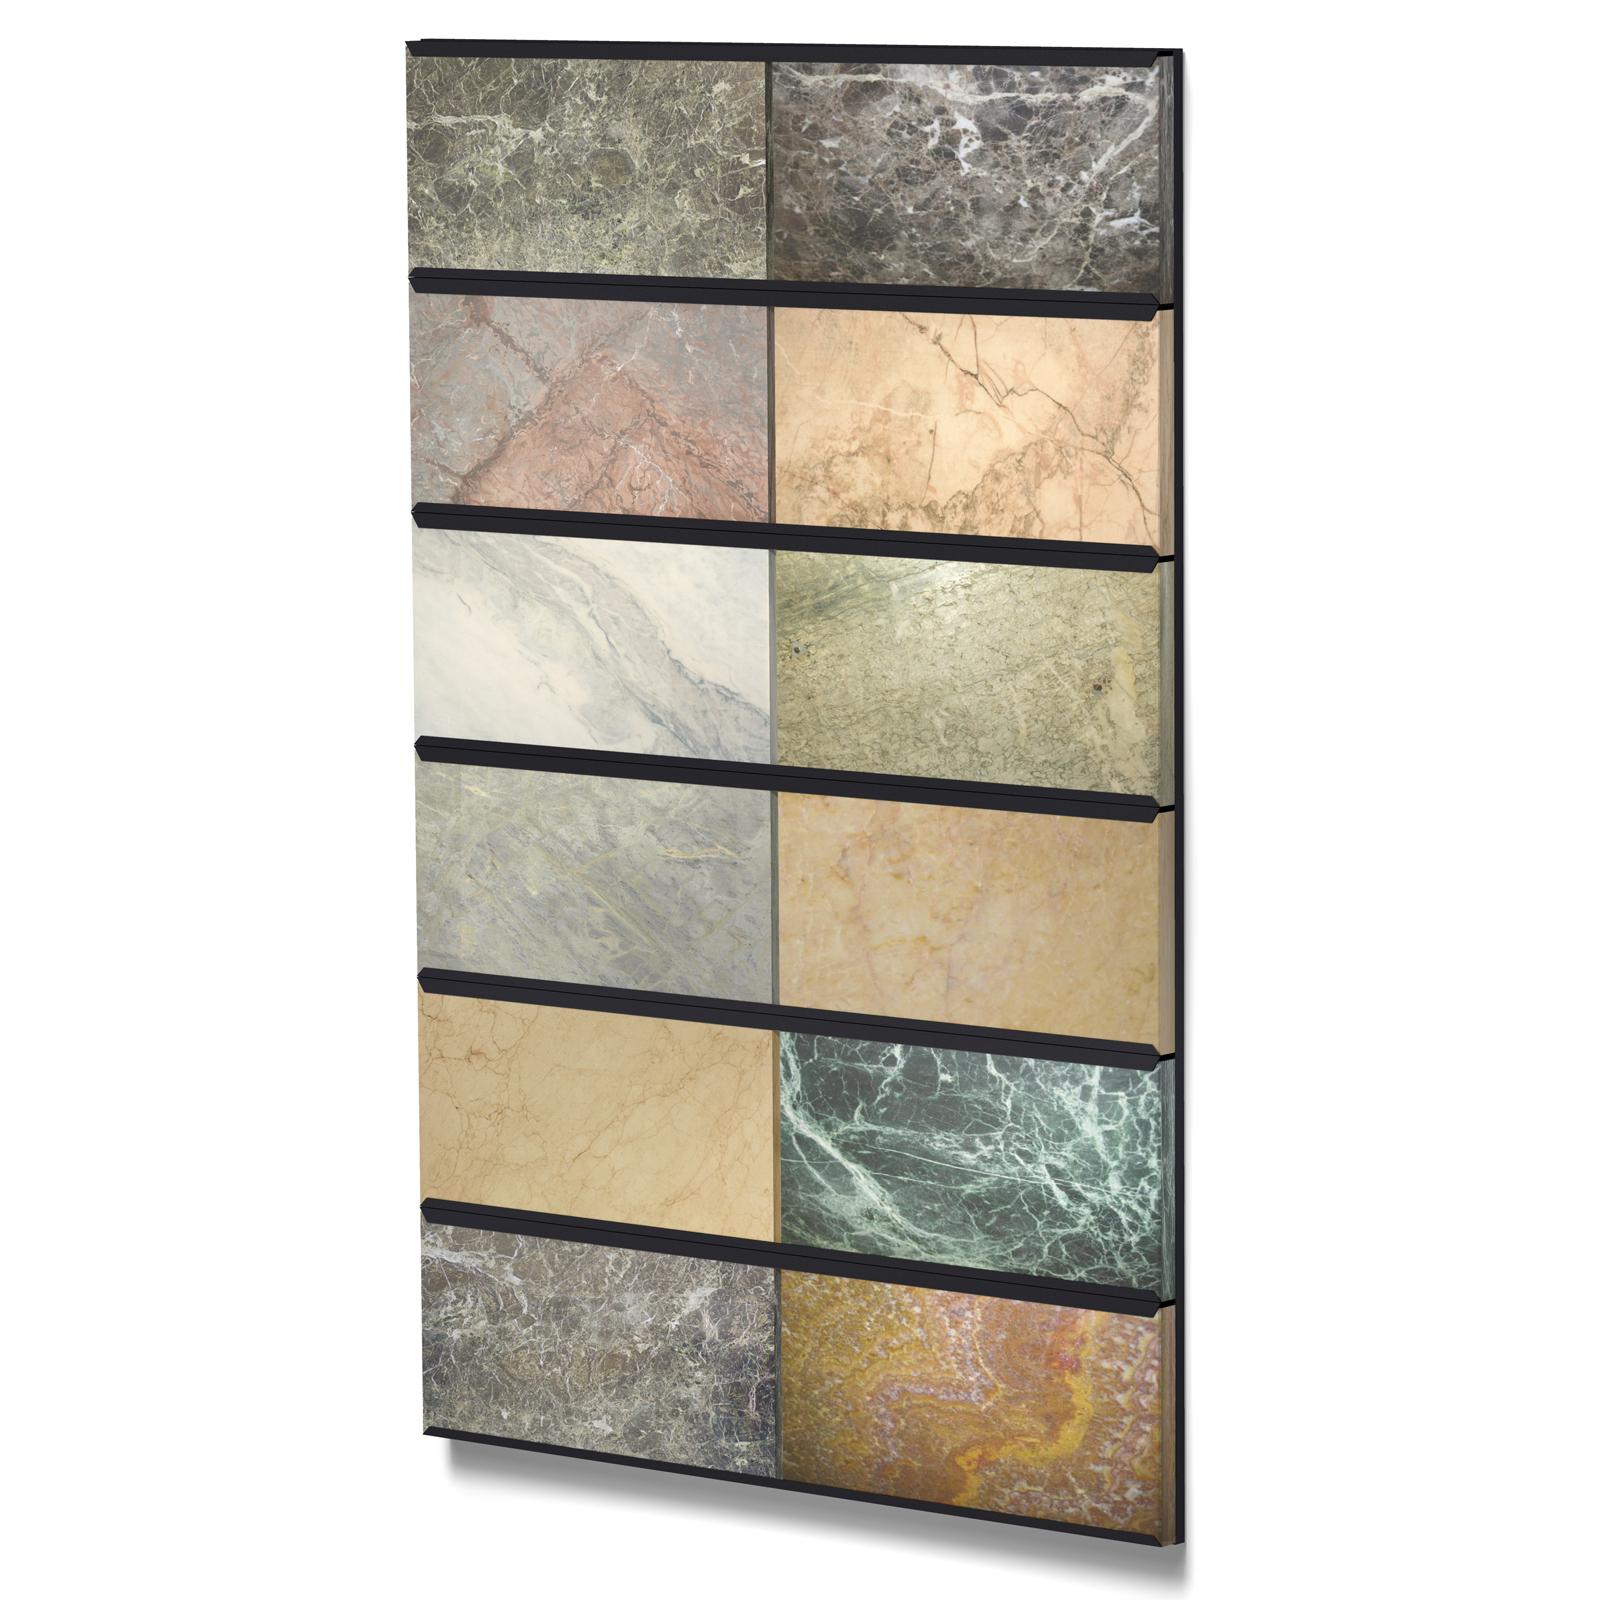 showroom wall mounted slide mosaic tile display ceramic rack buy ceramic tiles display stand wall mount display rack ceramic tiles metal shelf